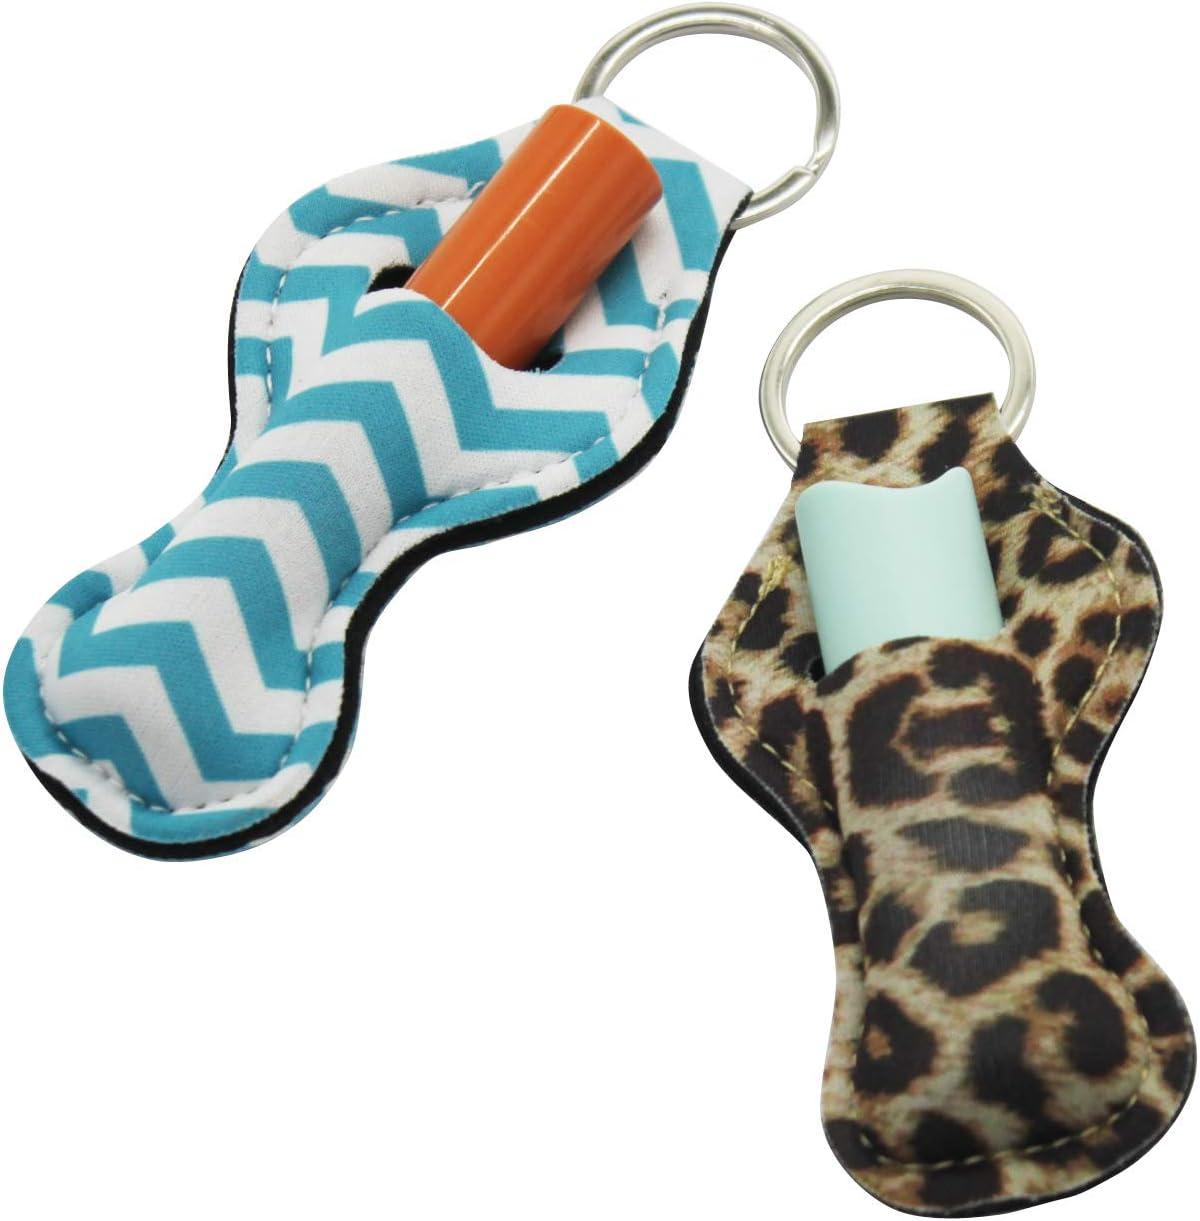 Chapstick Holder Keychain,10 Pack Lipstick Holder Keychains Different Vibrant Prints Neoprene Lip Blam Keychains,Lightweight Portable Pouch Style A